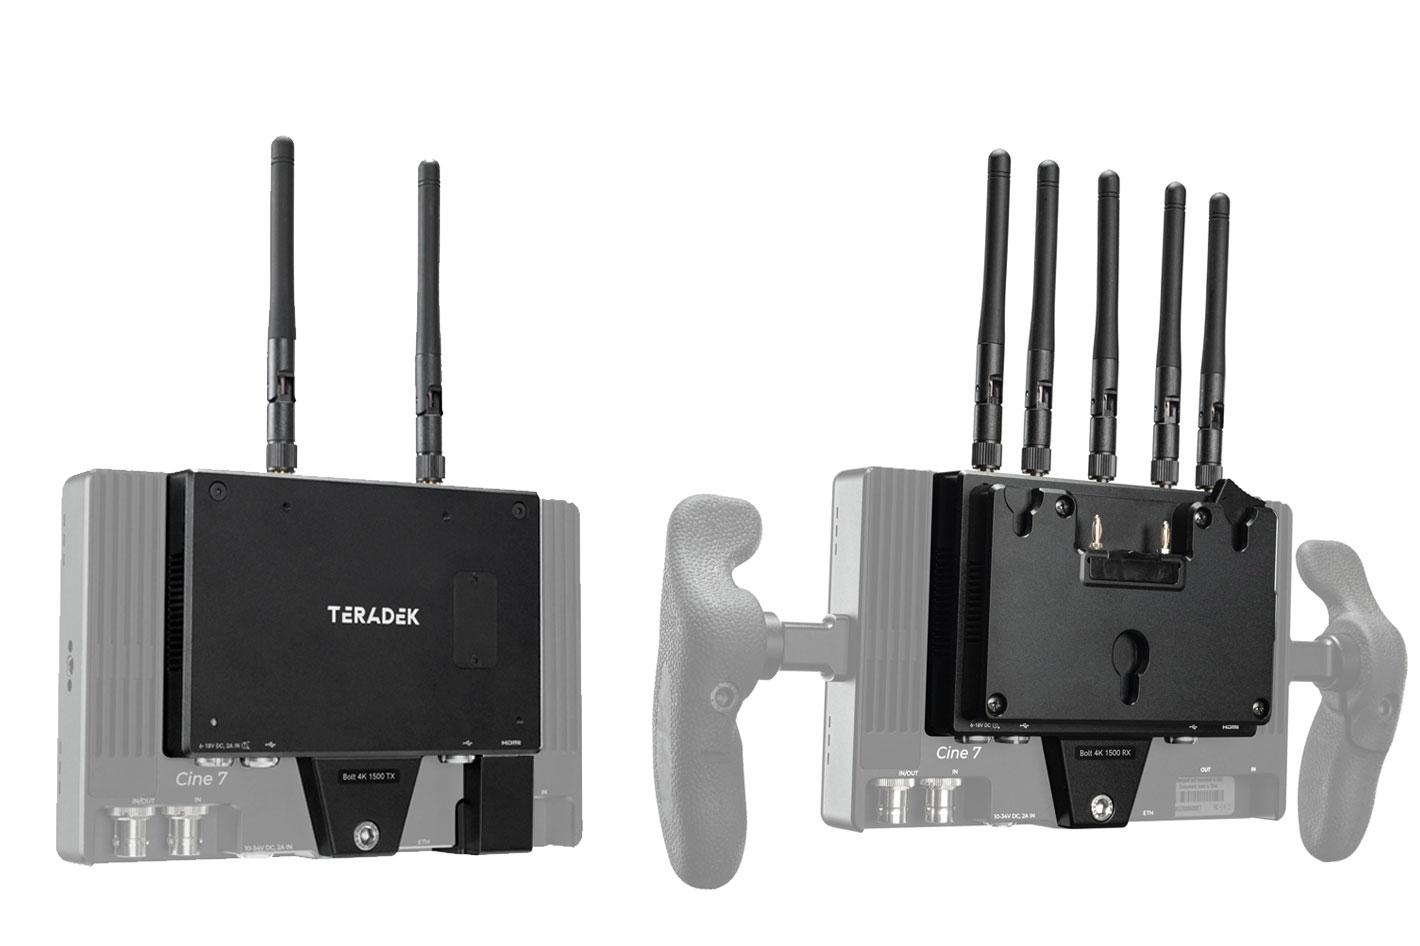 Teradek's new Bolt 4K monitor modules 1500 TX/RX